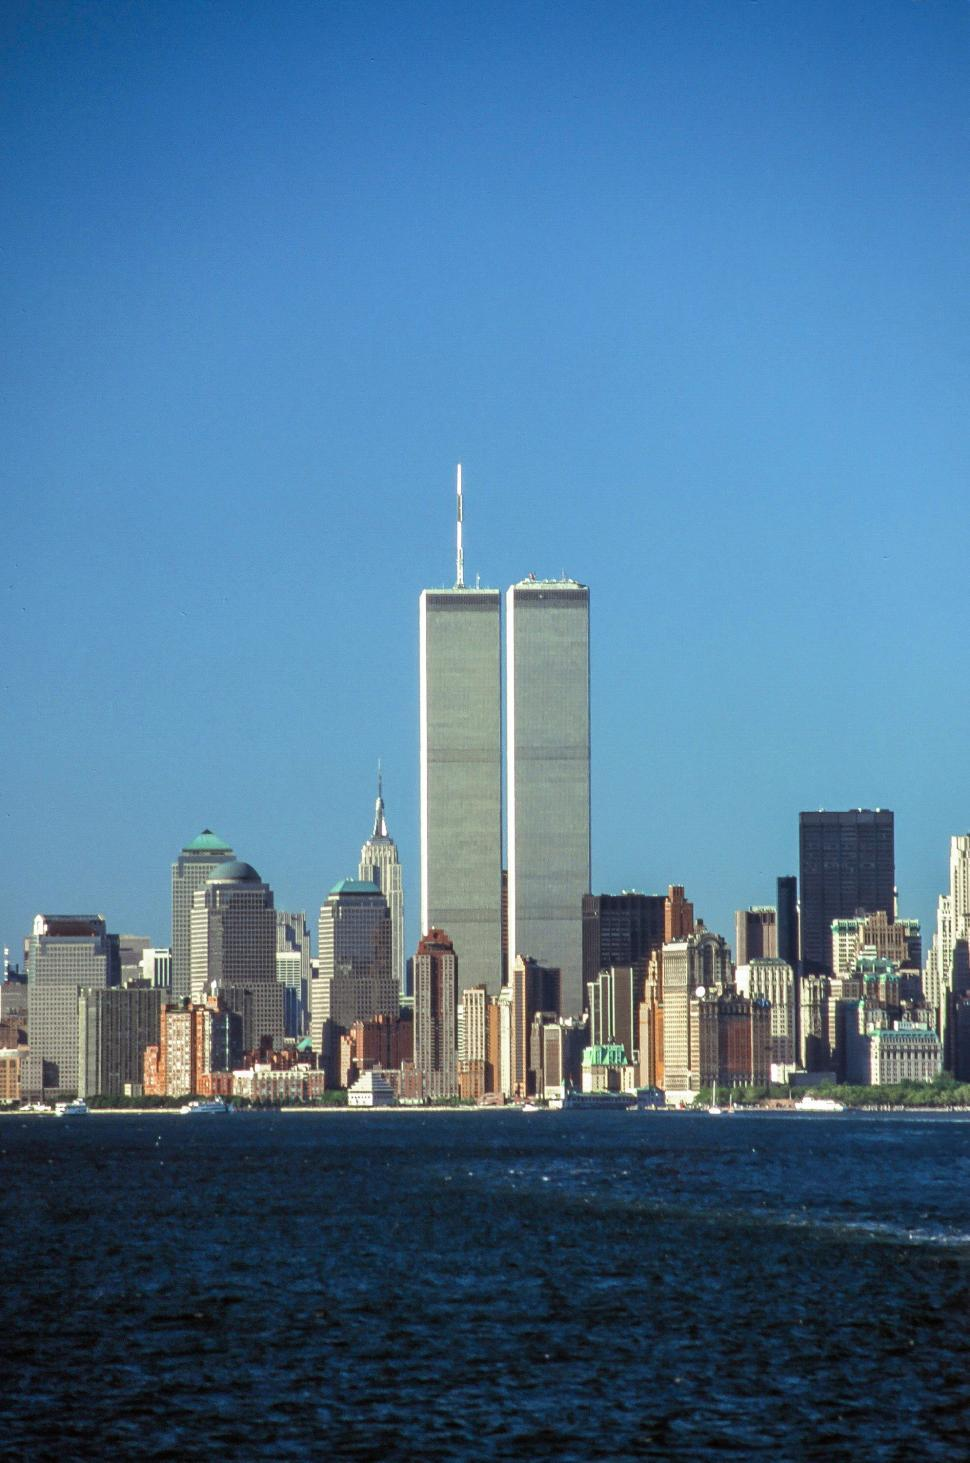 Download Free Stock Photo of World Trade Center lower Manhattan